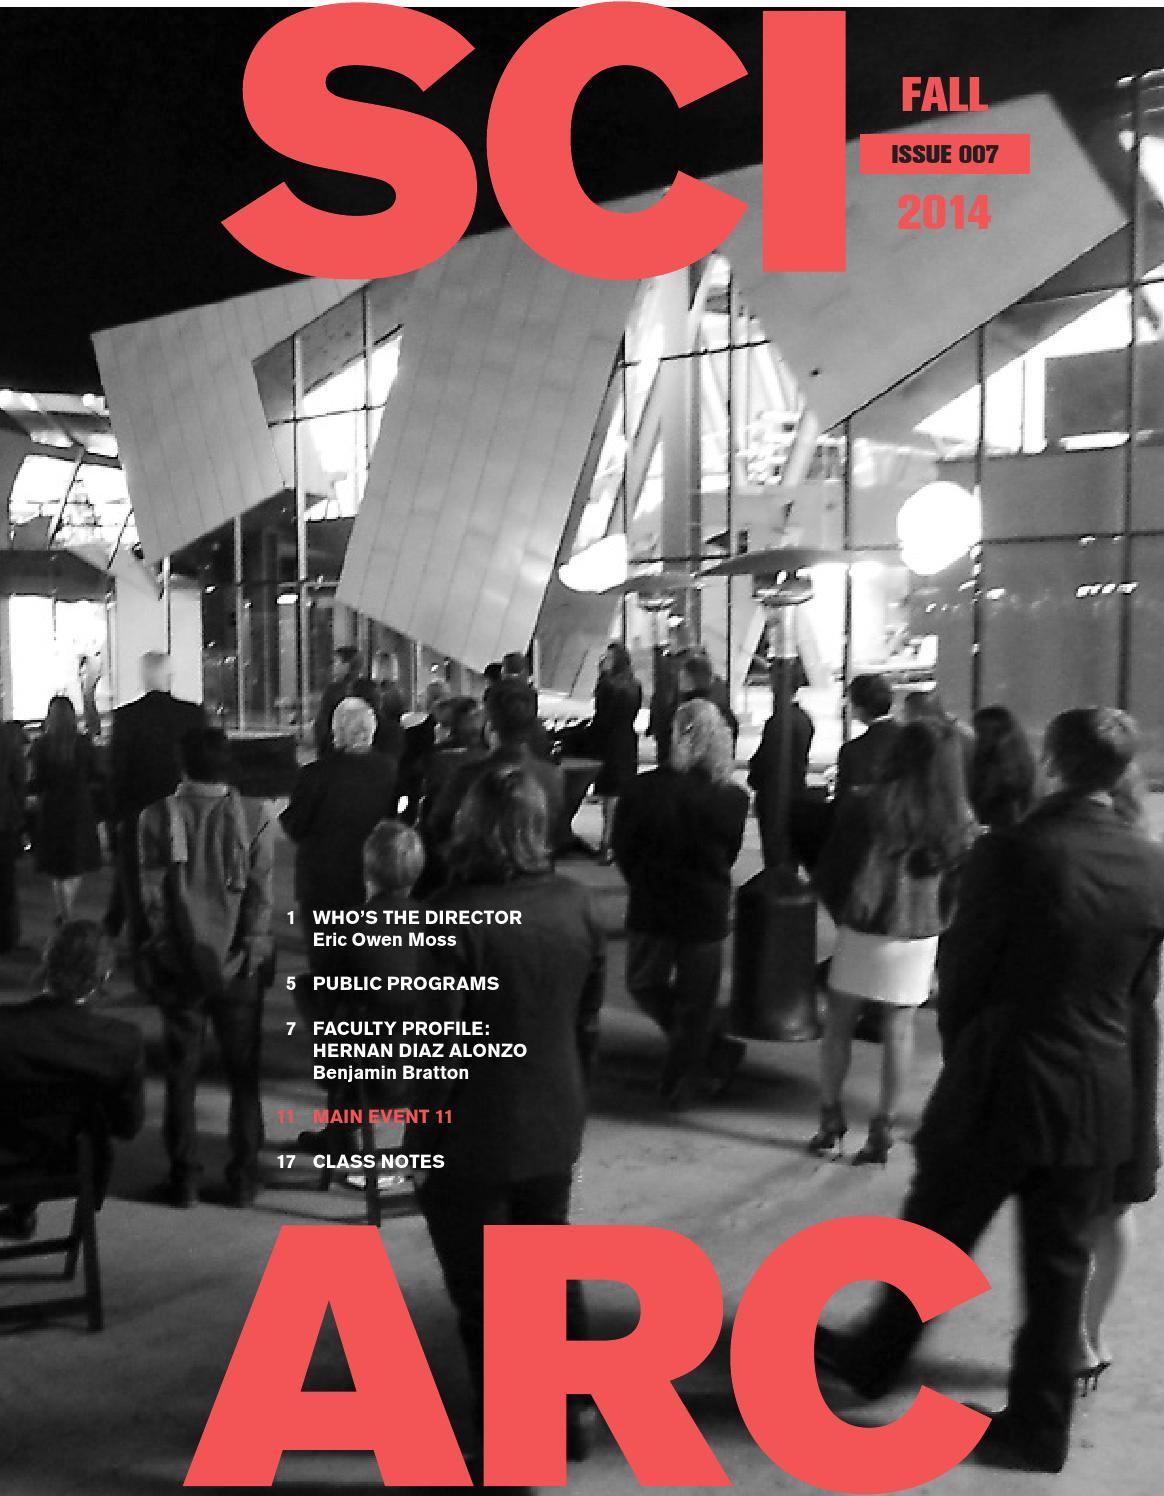 2cb6f77da5 SCI-Arc Alumni Magazine 009 - Fall 2014 by SCI-Arc - issuu